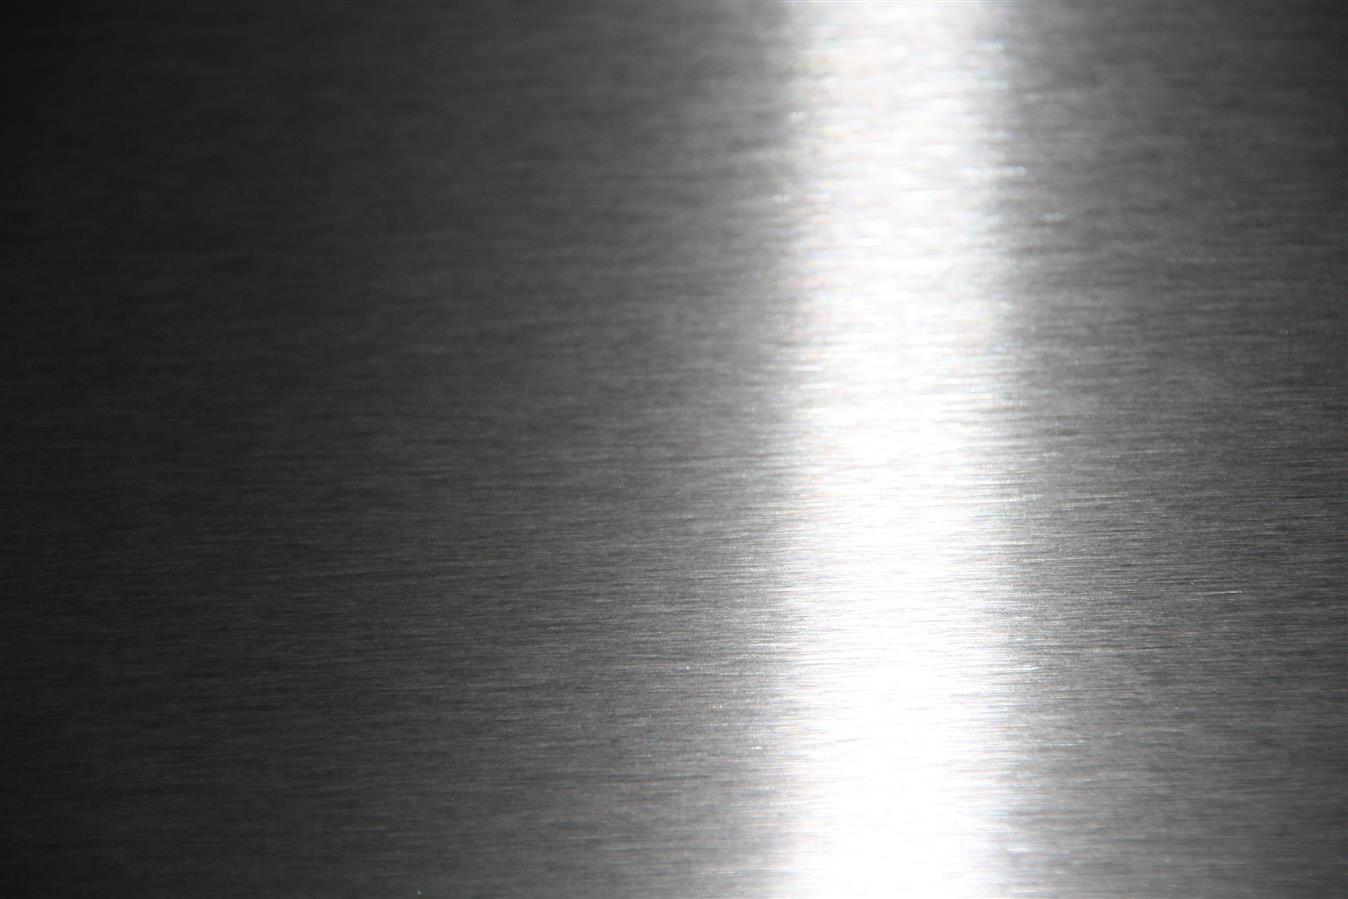 1 3mm edelstahlblech k240 geschliffen einseitig folie ebay. Black Bedroom Furniture Sets. Home Design Ideas